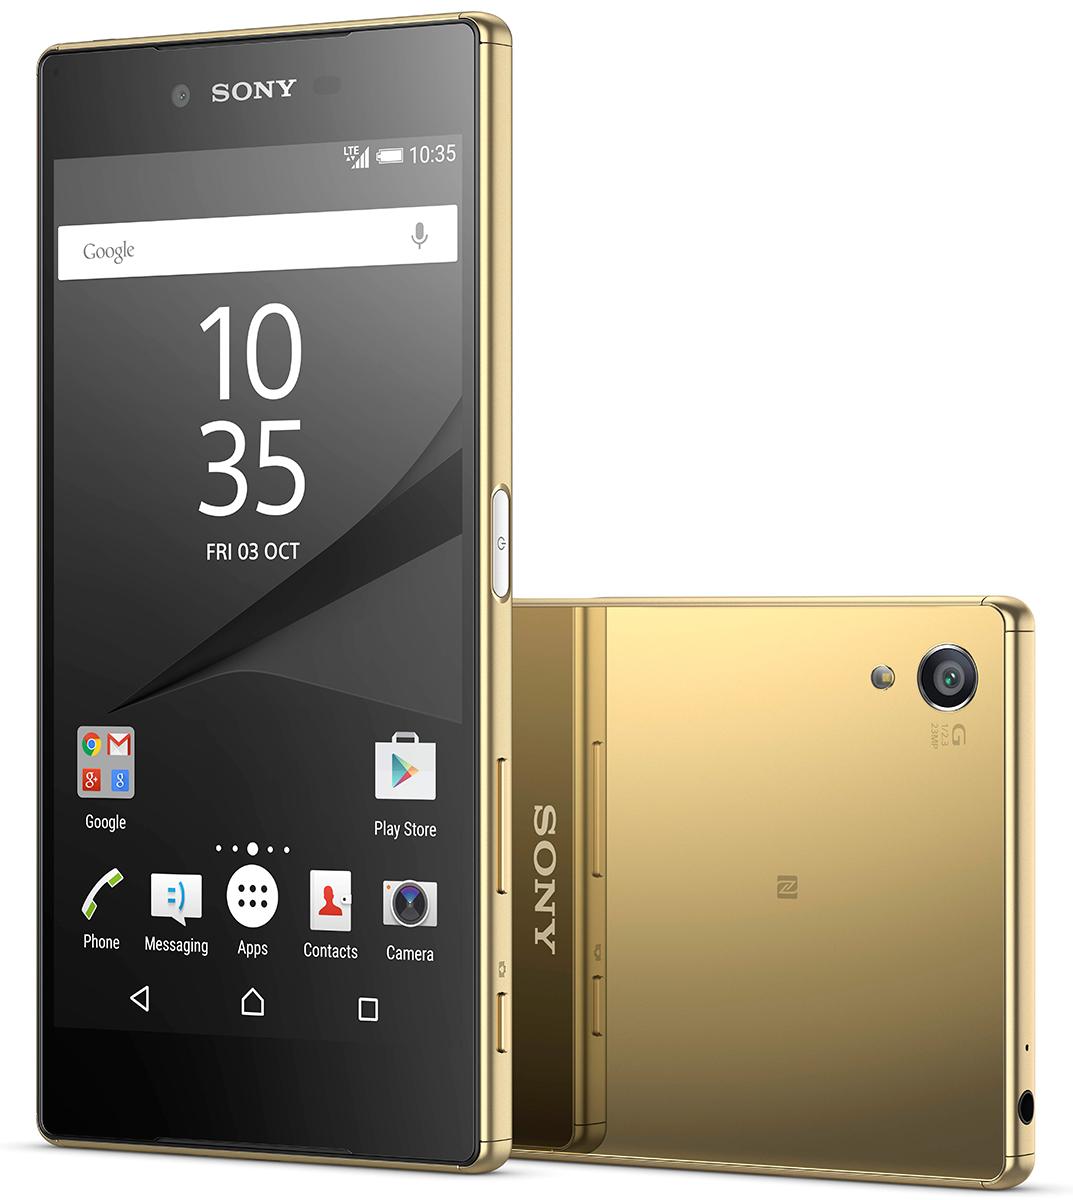 Sony xperia z5 premium release date - 52